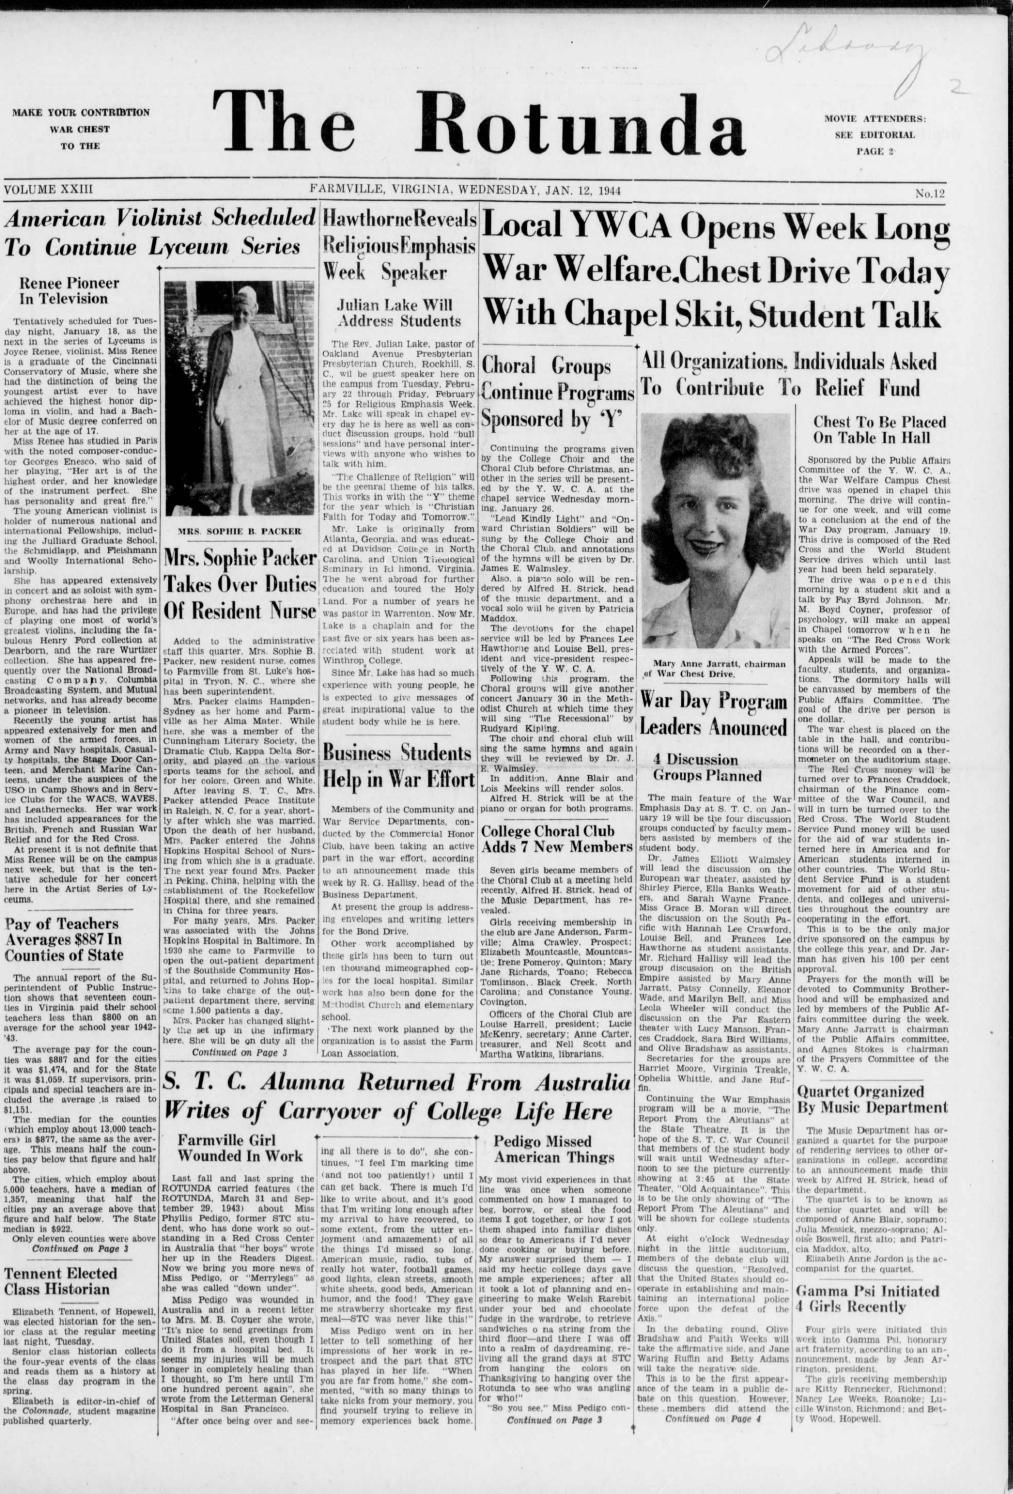 Rotunda vol 23, no 12 jan 12, 1944 by Greenwood Library - issuu